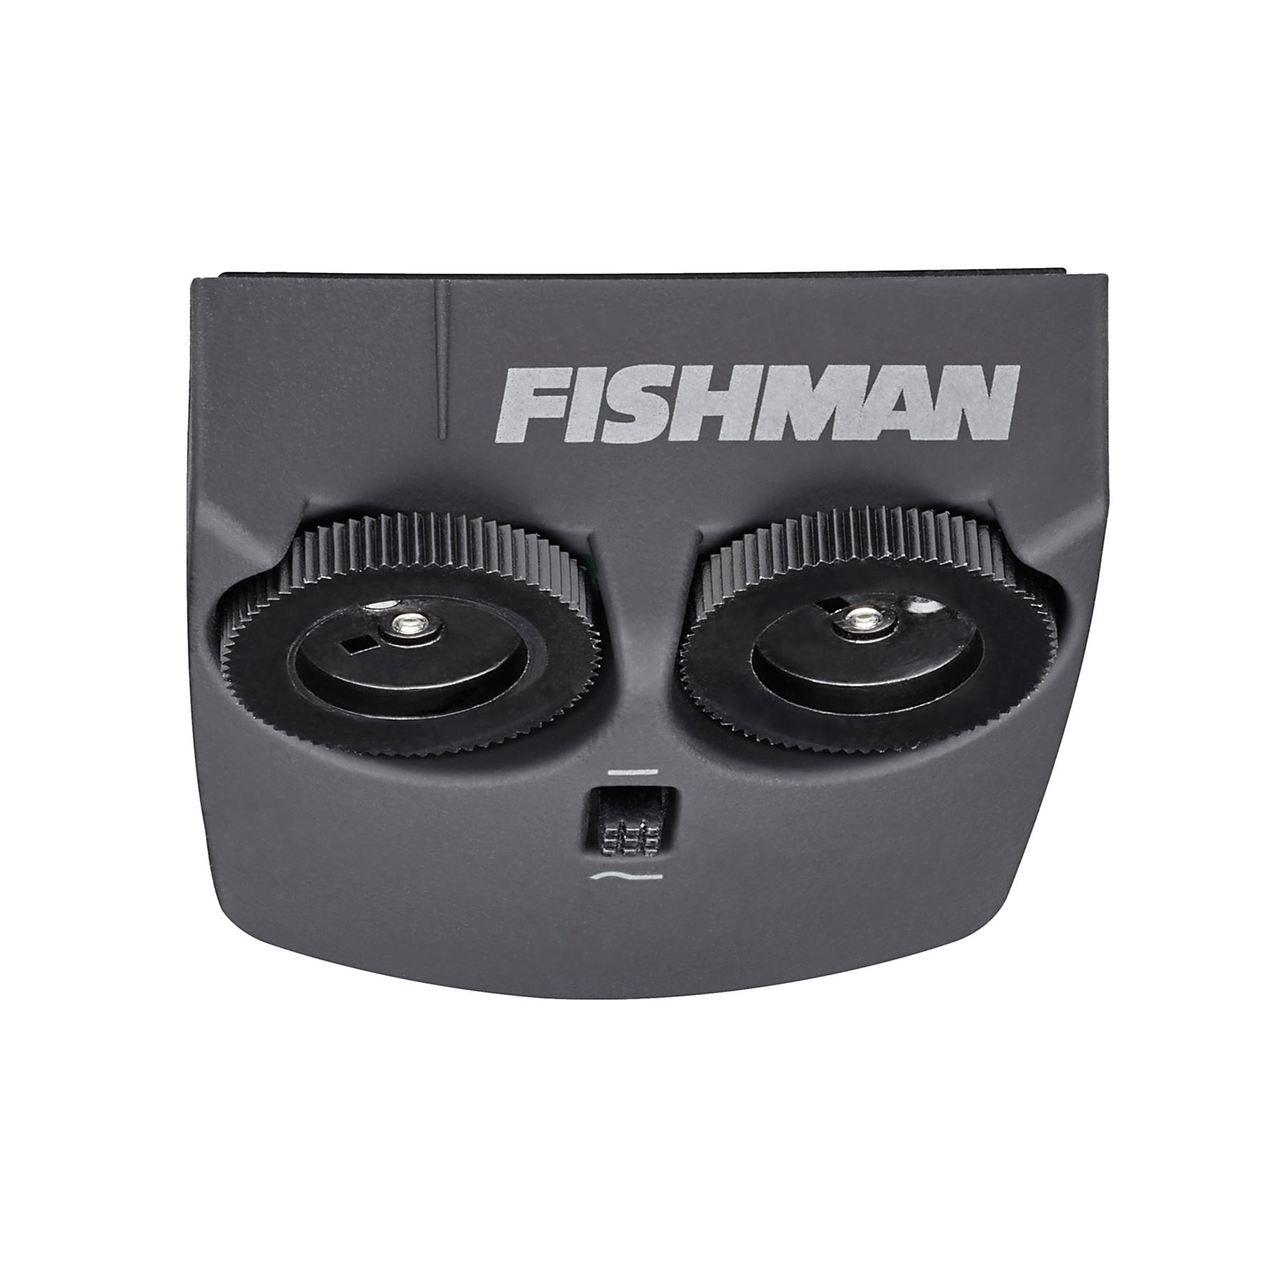 Fishman Matrix Infinity VT Narrow Format Acoustic Guitar Undersaddle Pickup & Preamp System